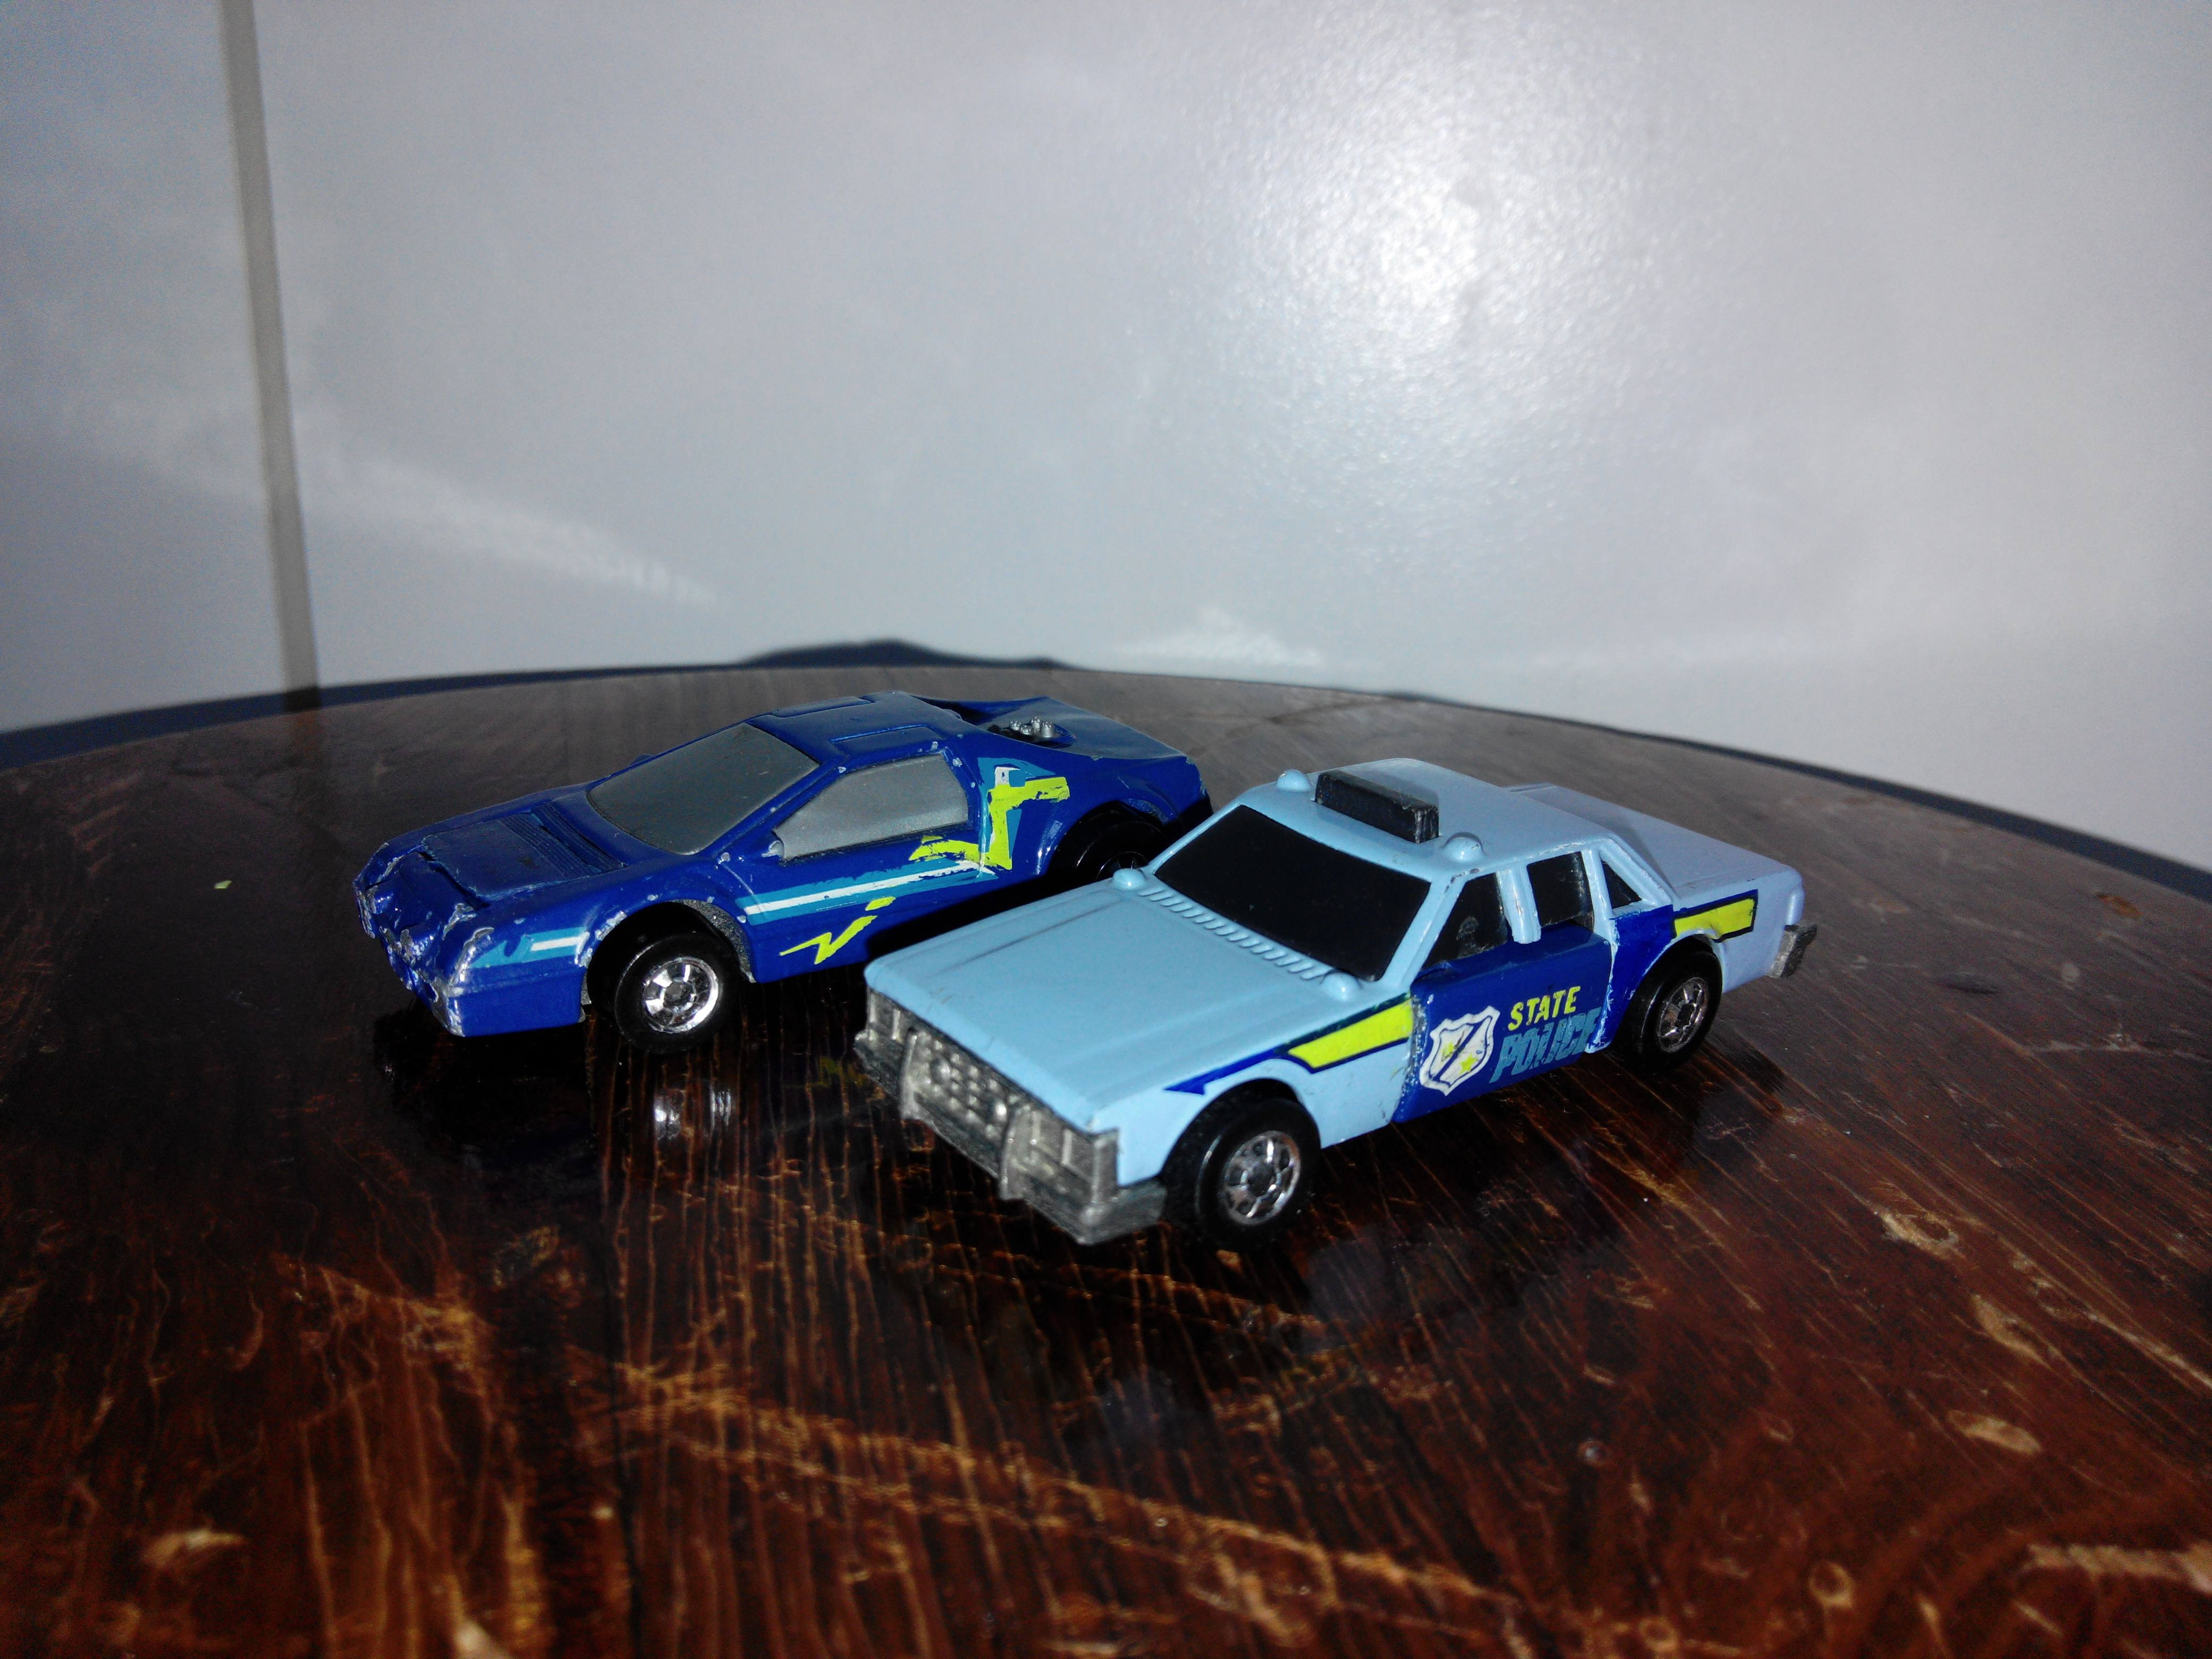 Hot Wheels crack ups